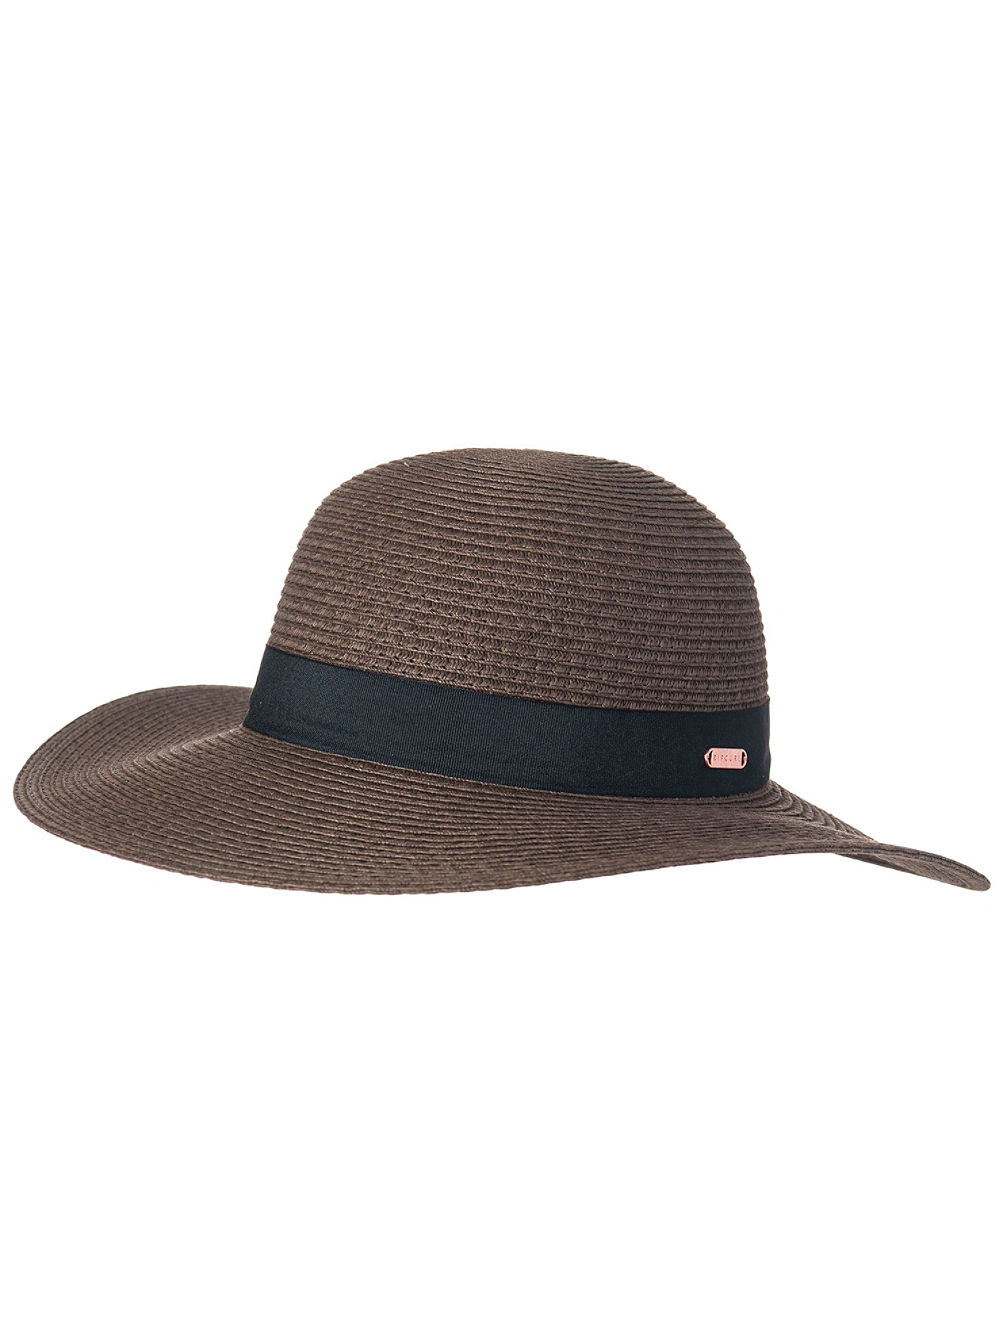 c59cead846a Buy Rip Curl Dakota Short Brim Boho Hat online at blue-tomato.com